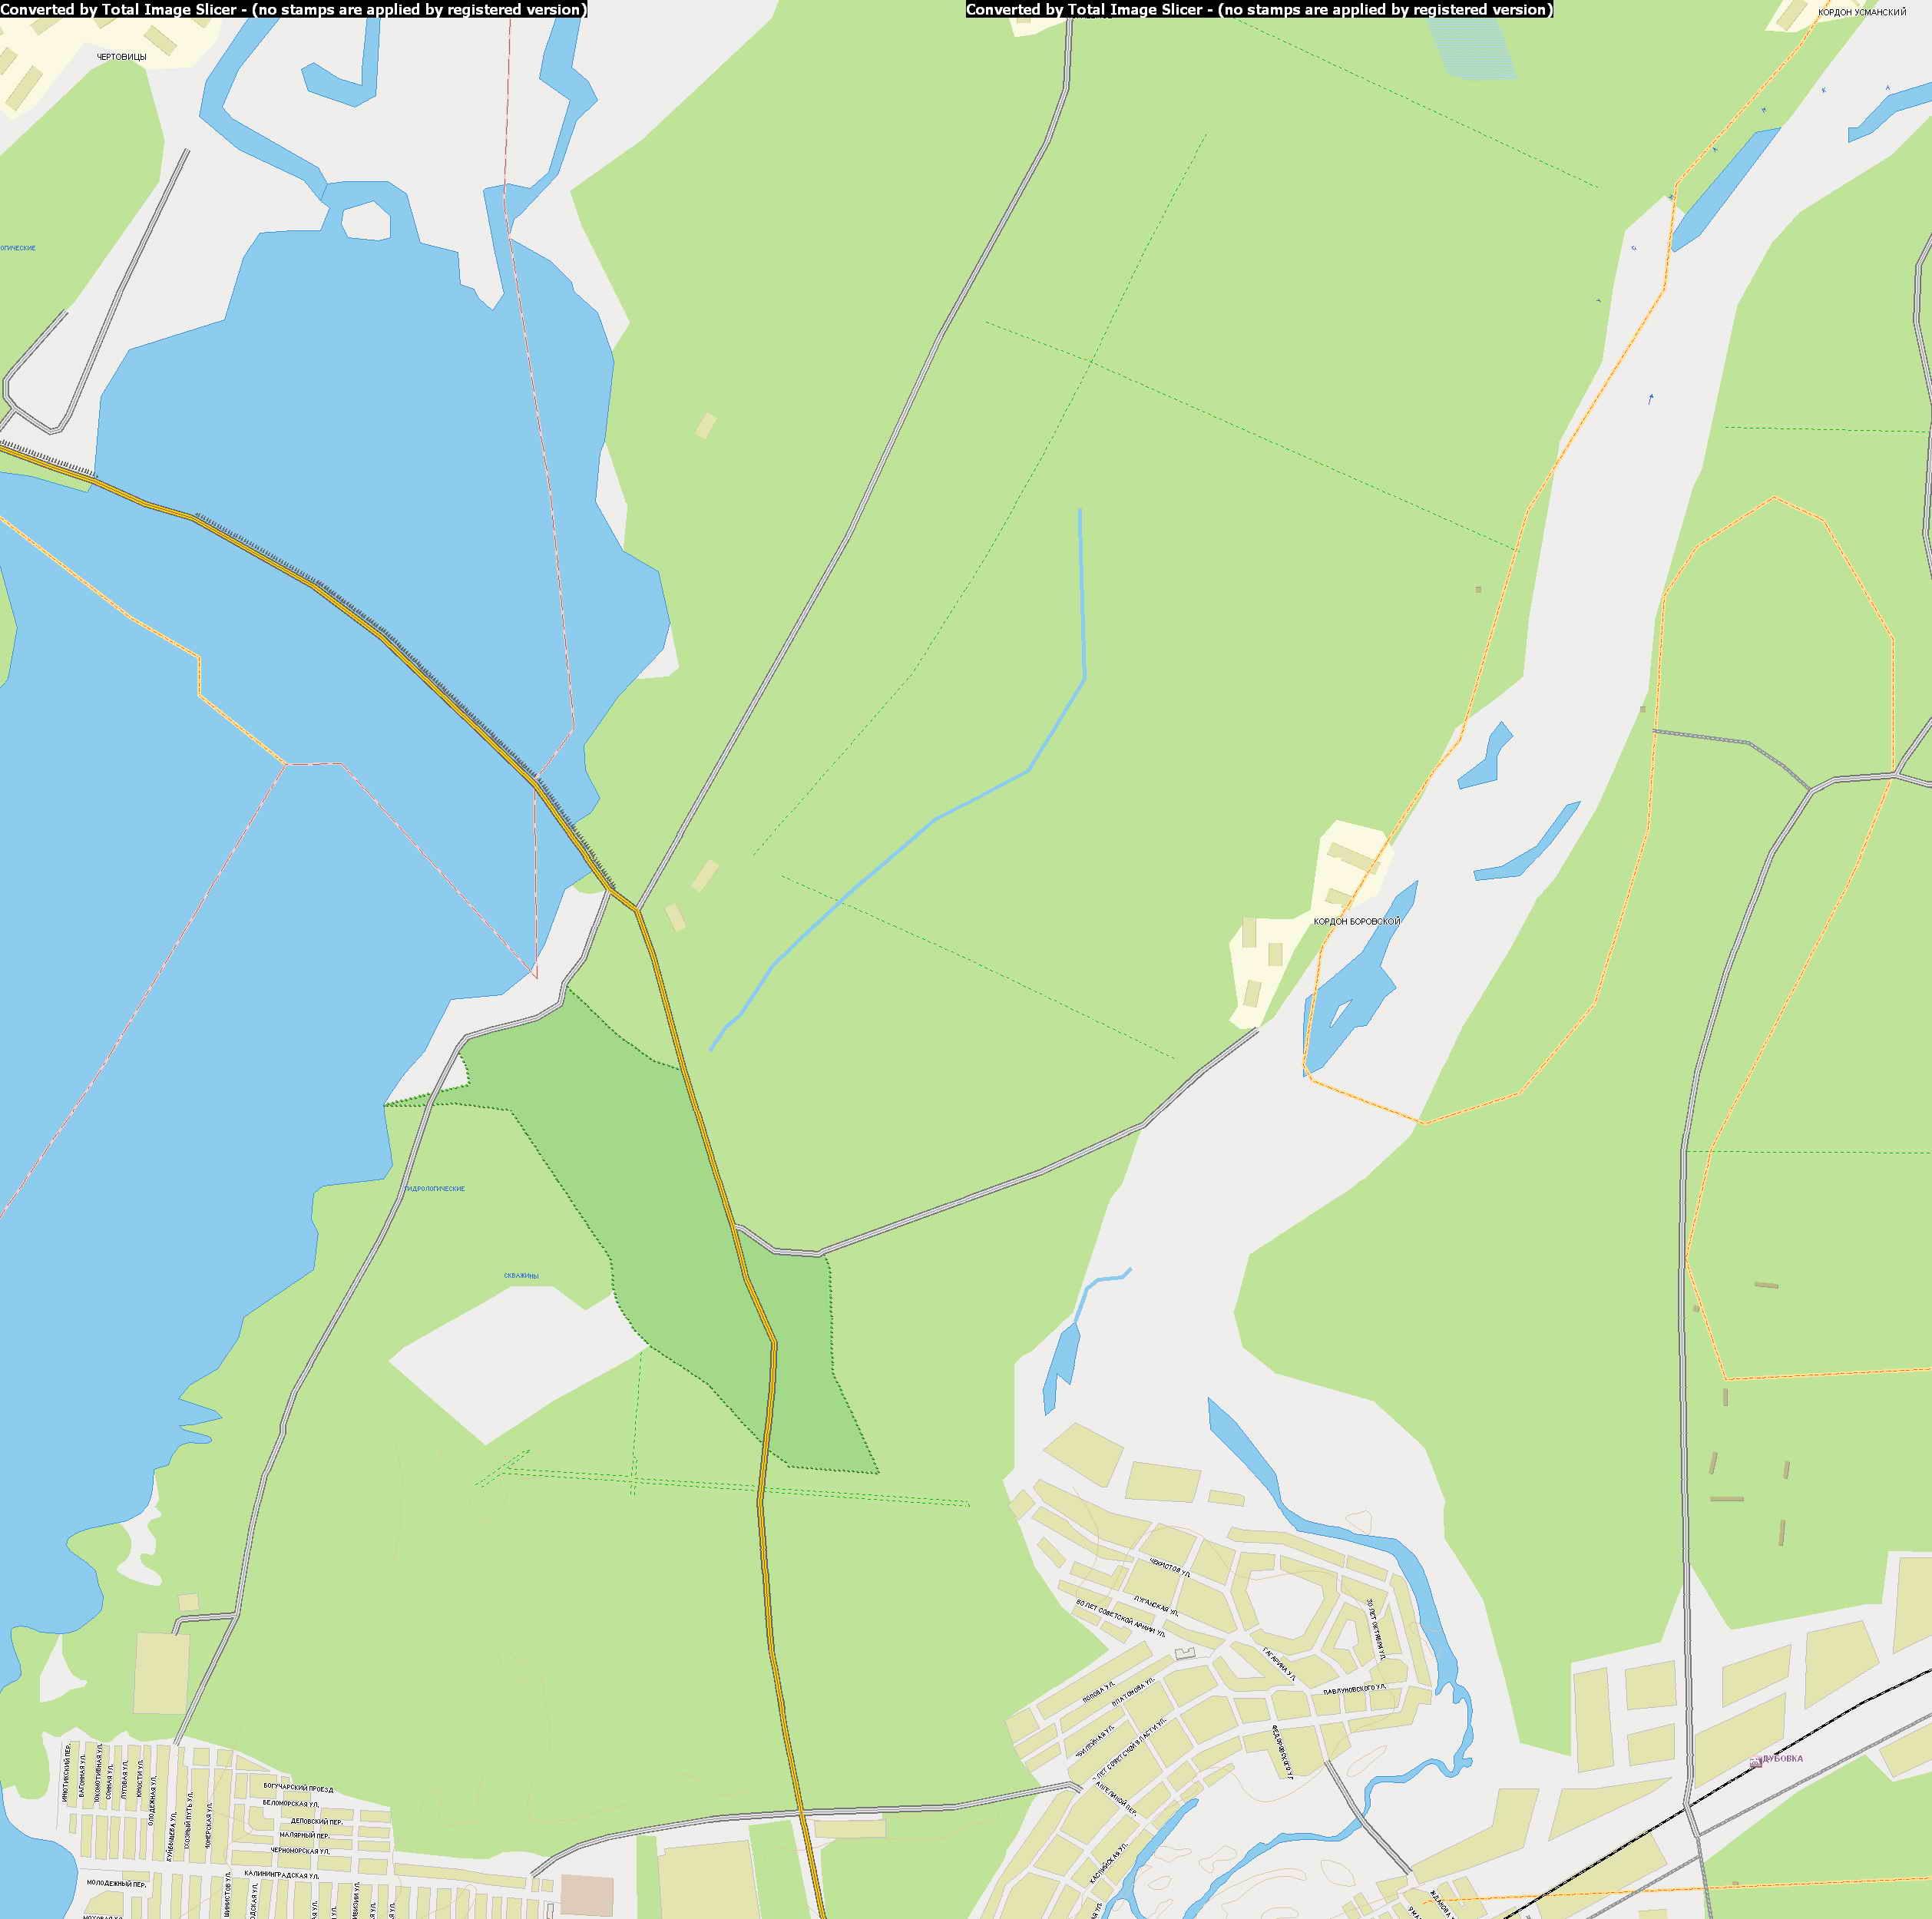 Карта г. Воронеж 1см = 135м. Карта автодорог, районов ...: http://www.raster-maps.com/map-of-russia-136/